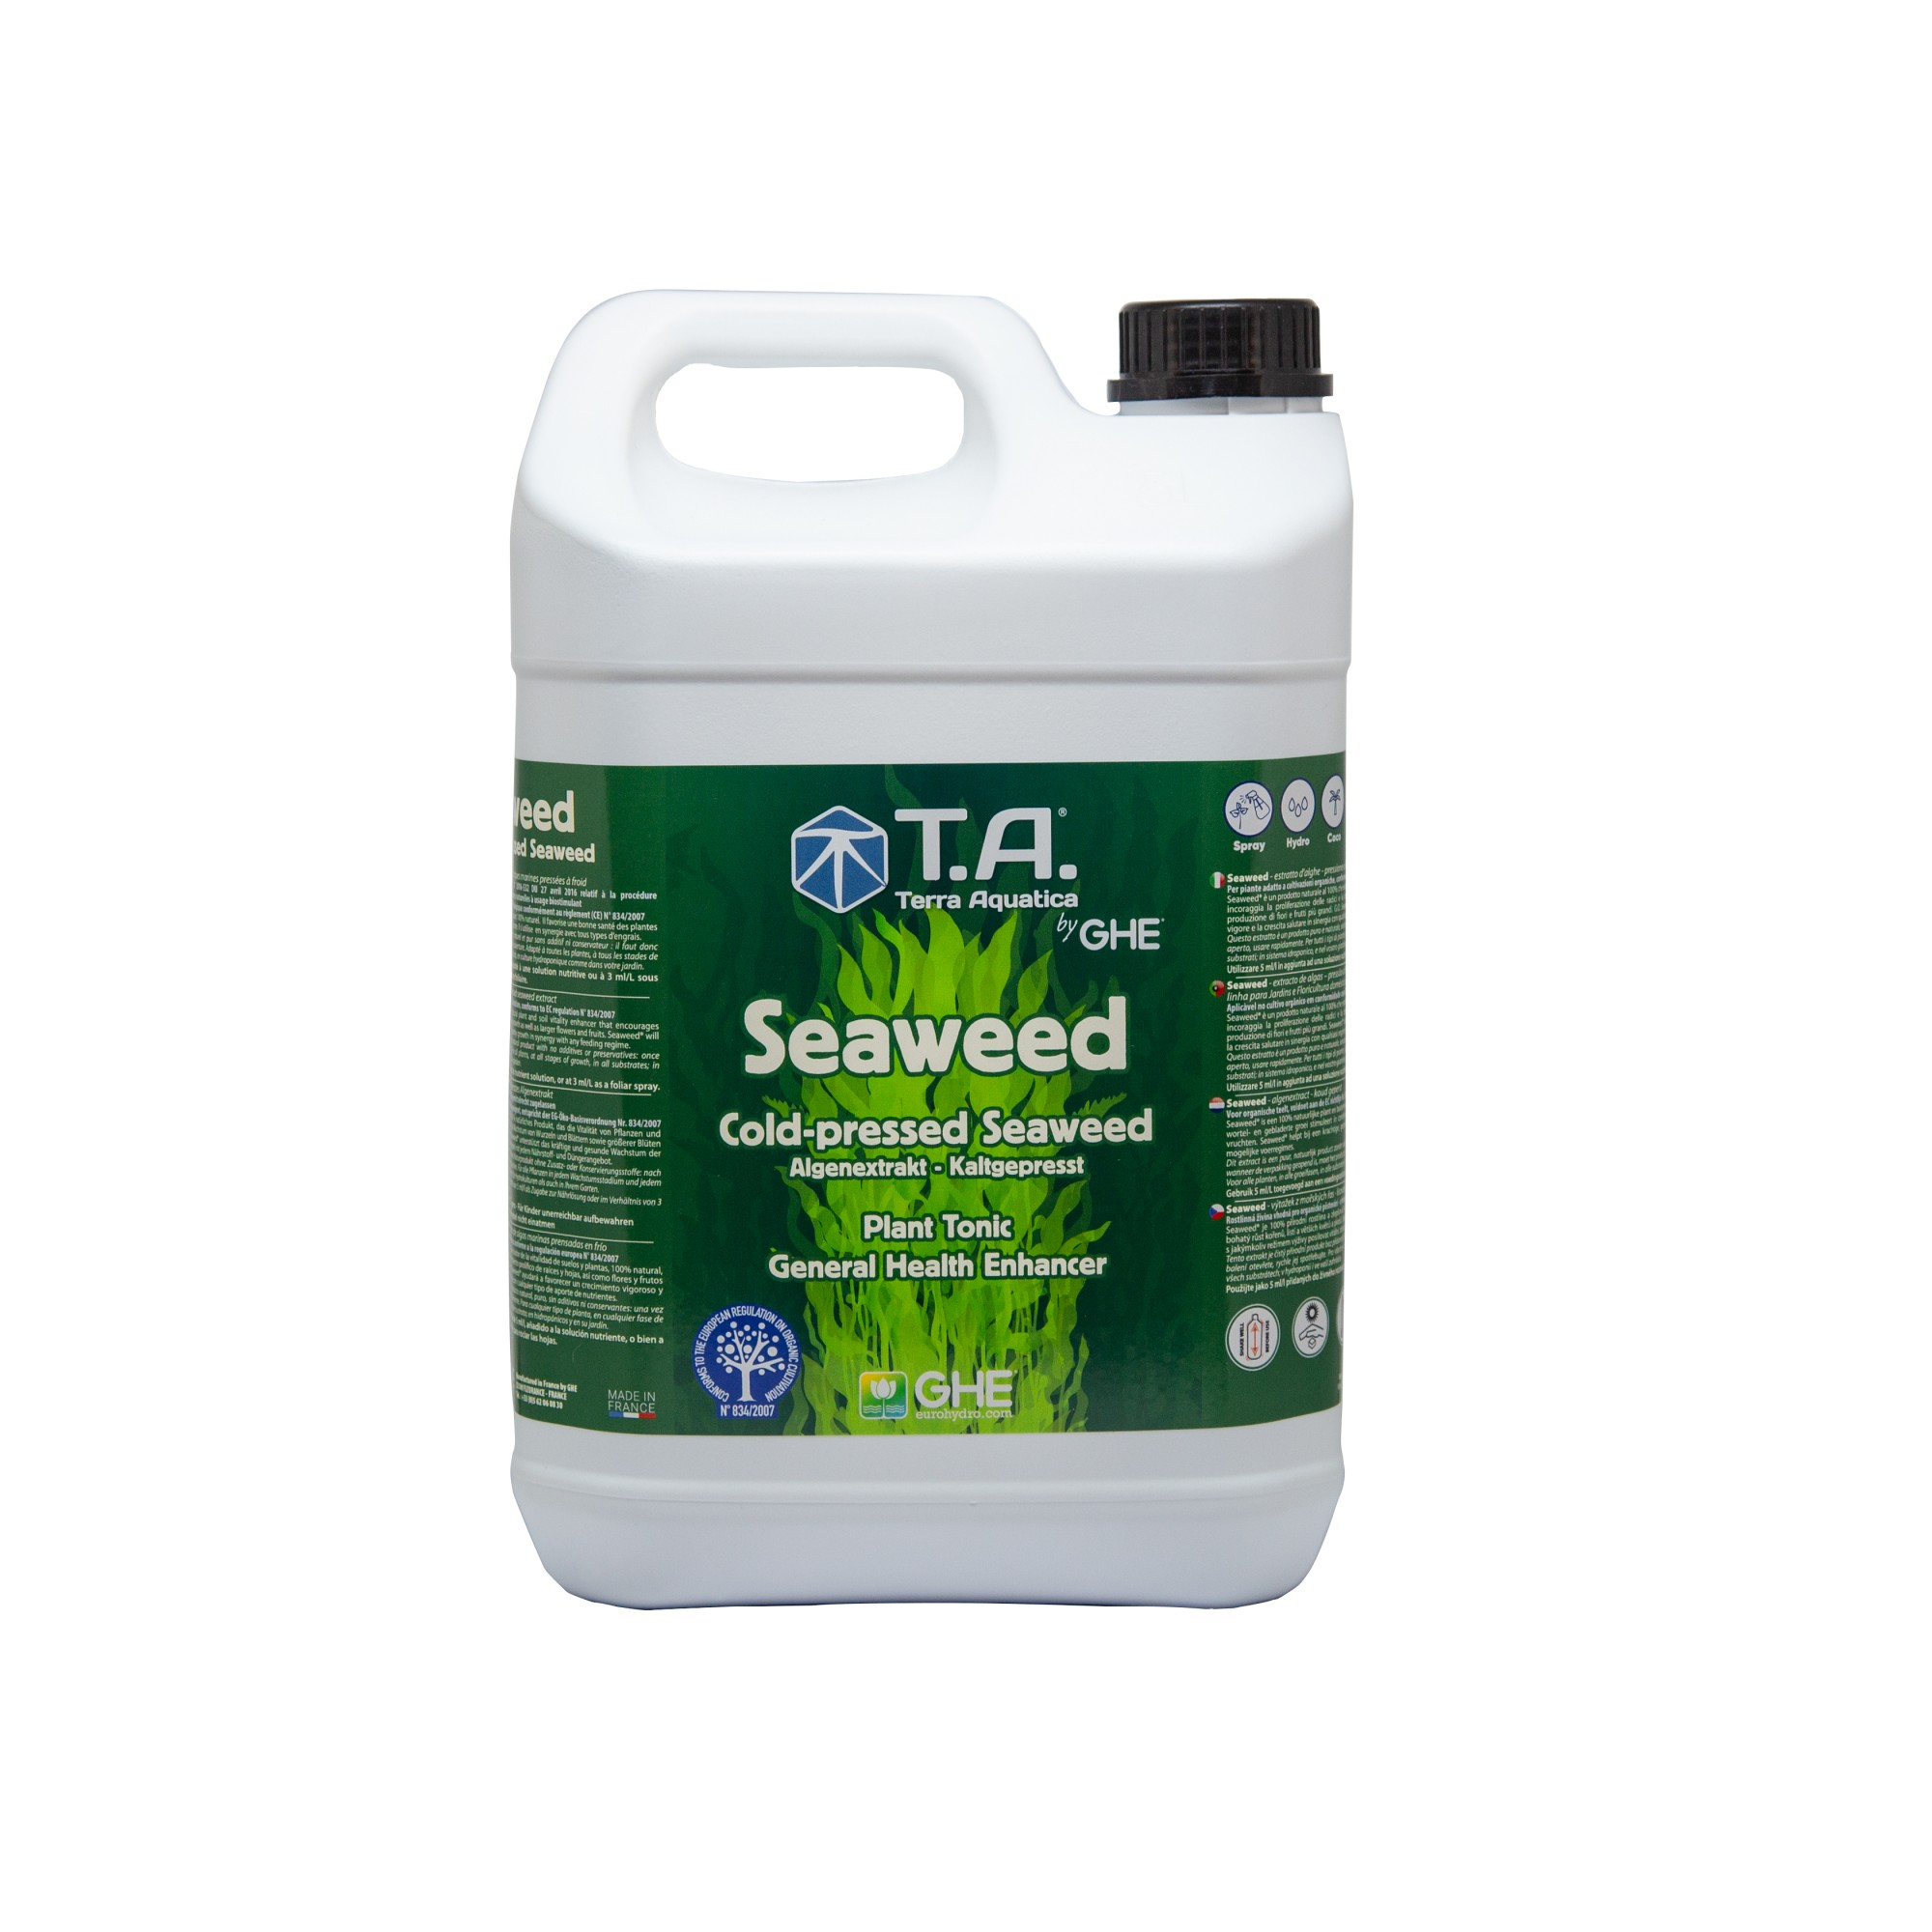 GHE GO Bio Weed 60L (Seaweed)